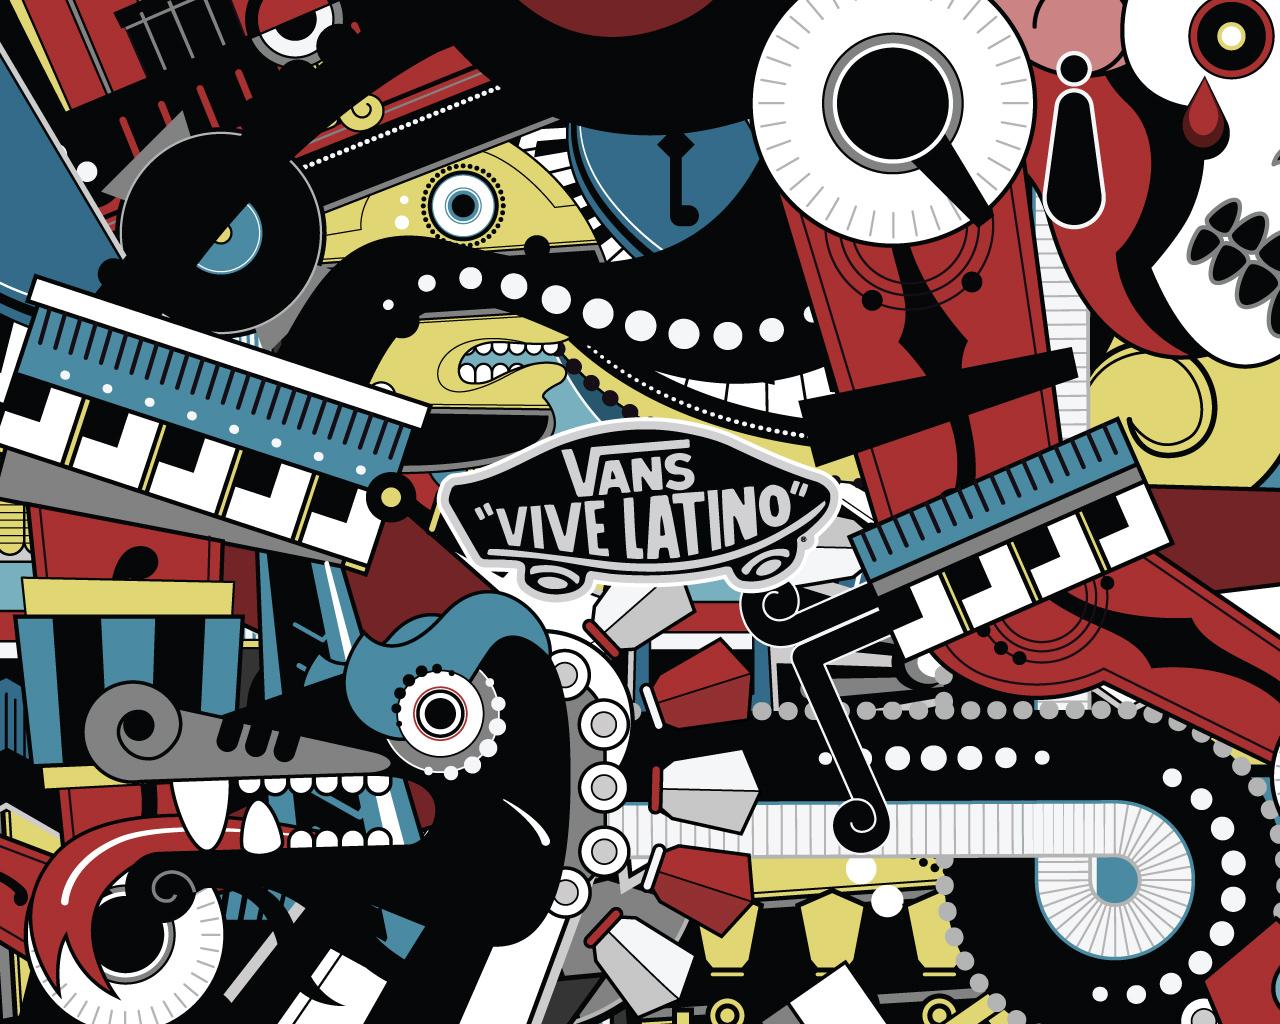 Marvellous Vans Logo Wallpaper 1280x1024px